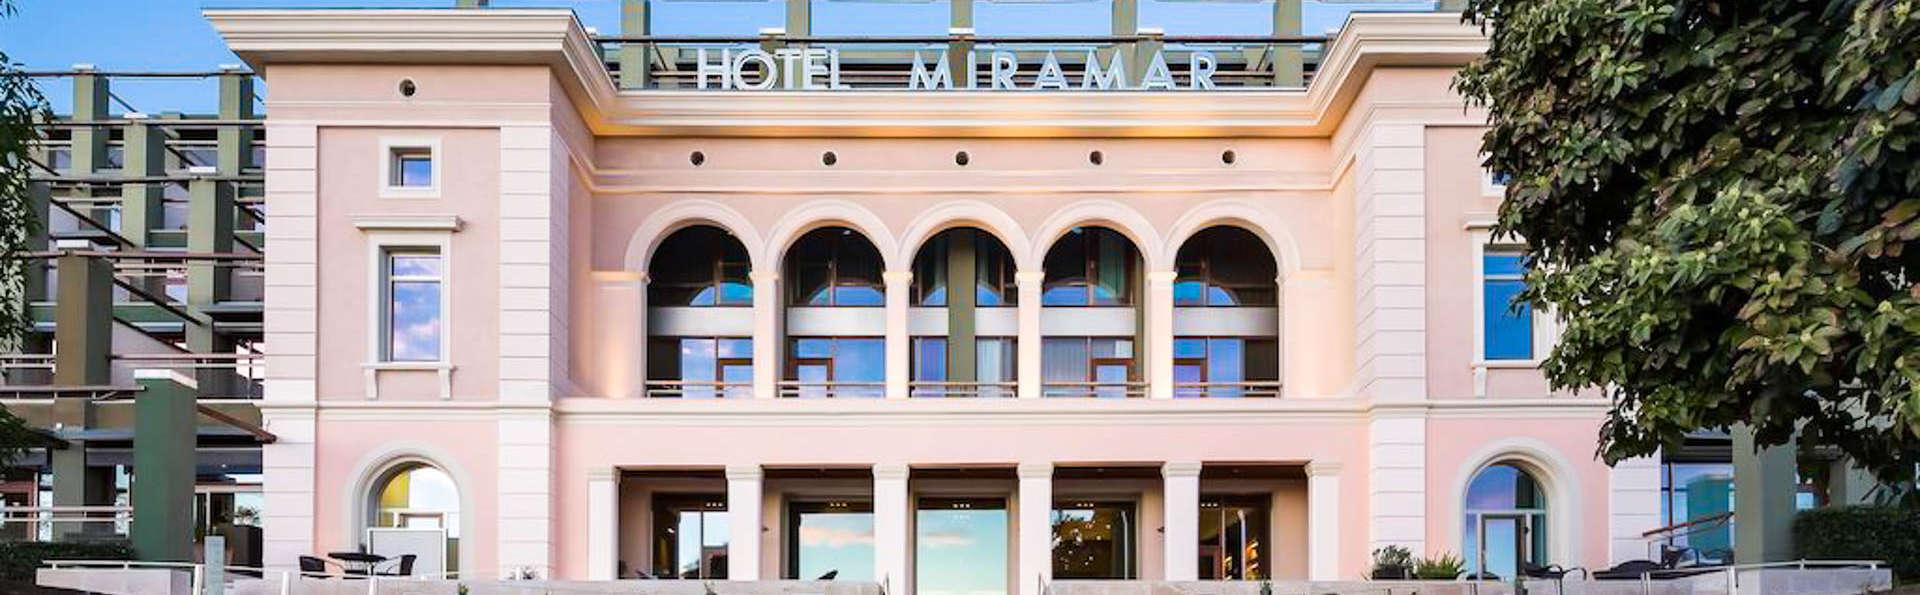 Hotel Miramar Barcelona - EDIT_FRONT.jpg